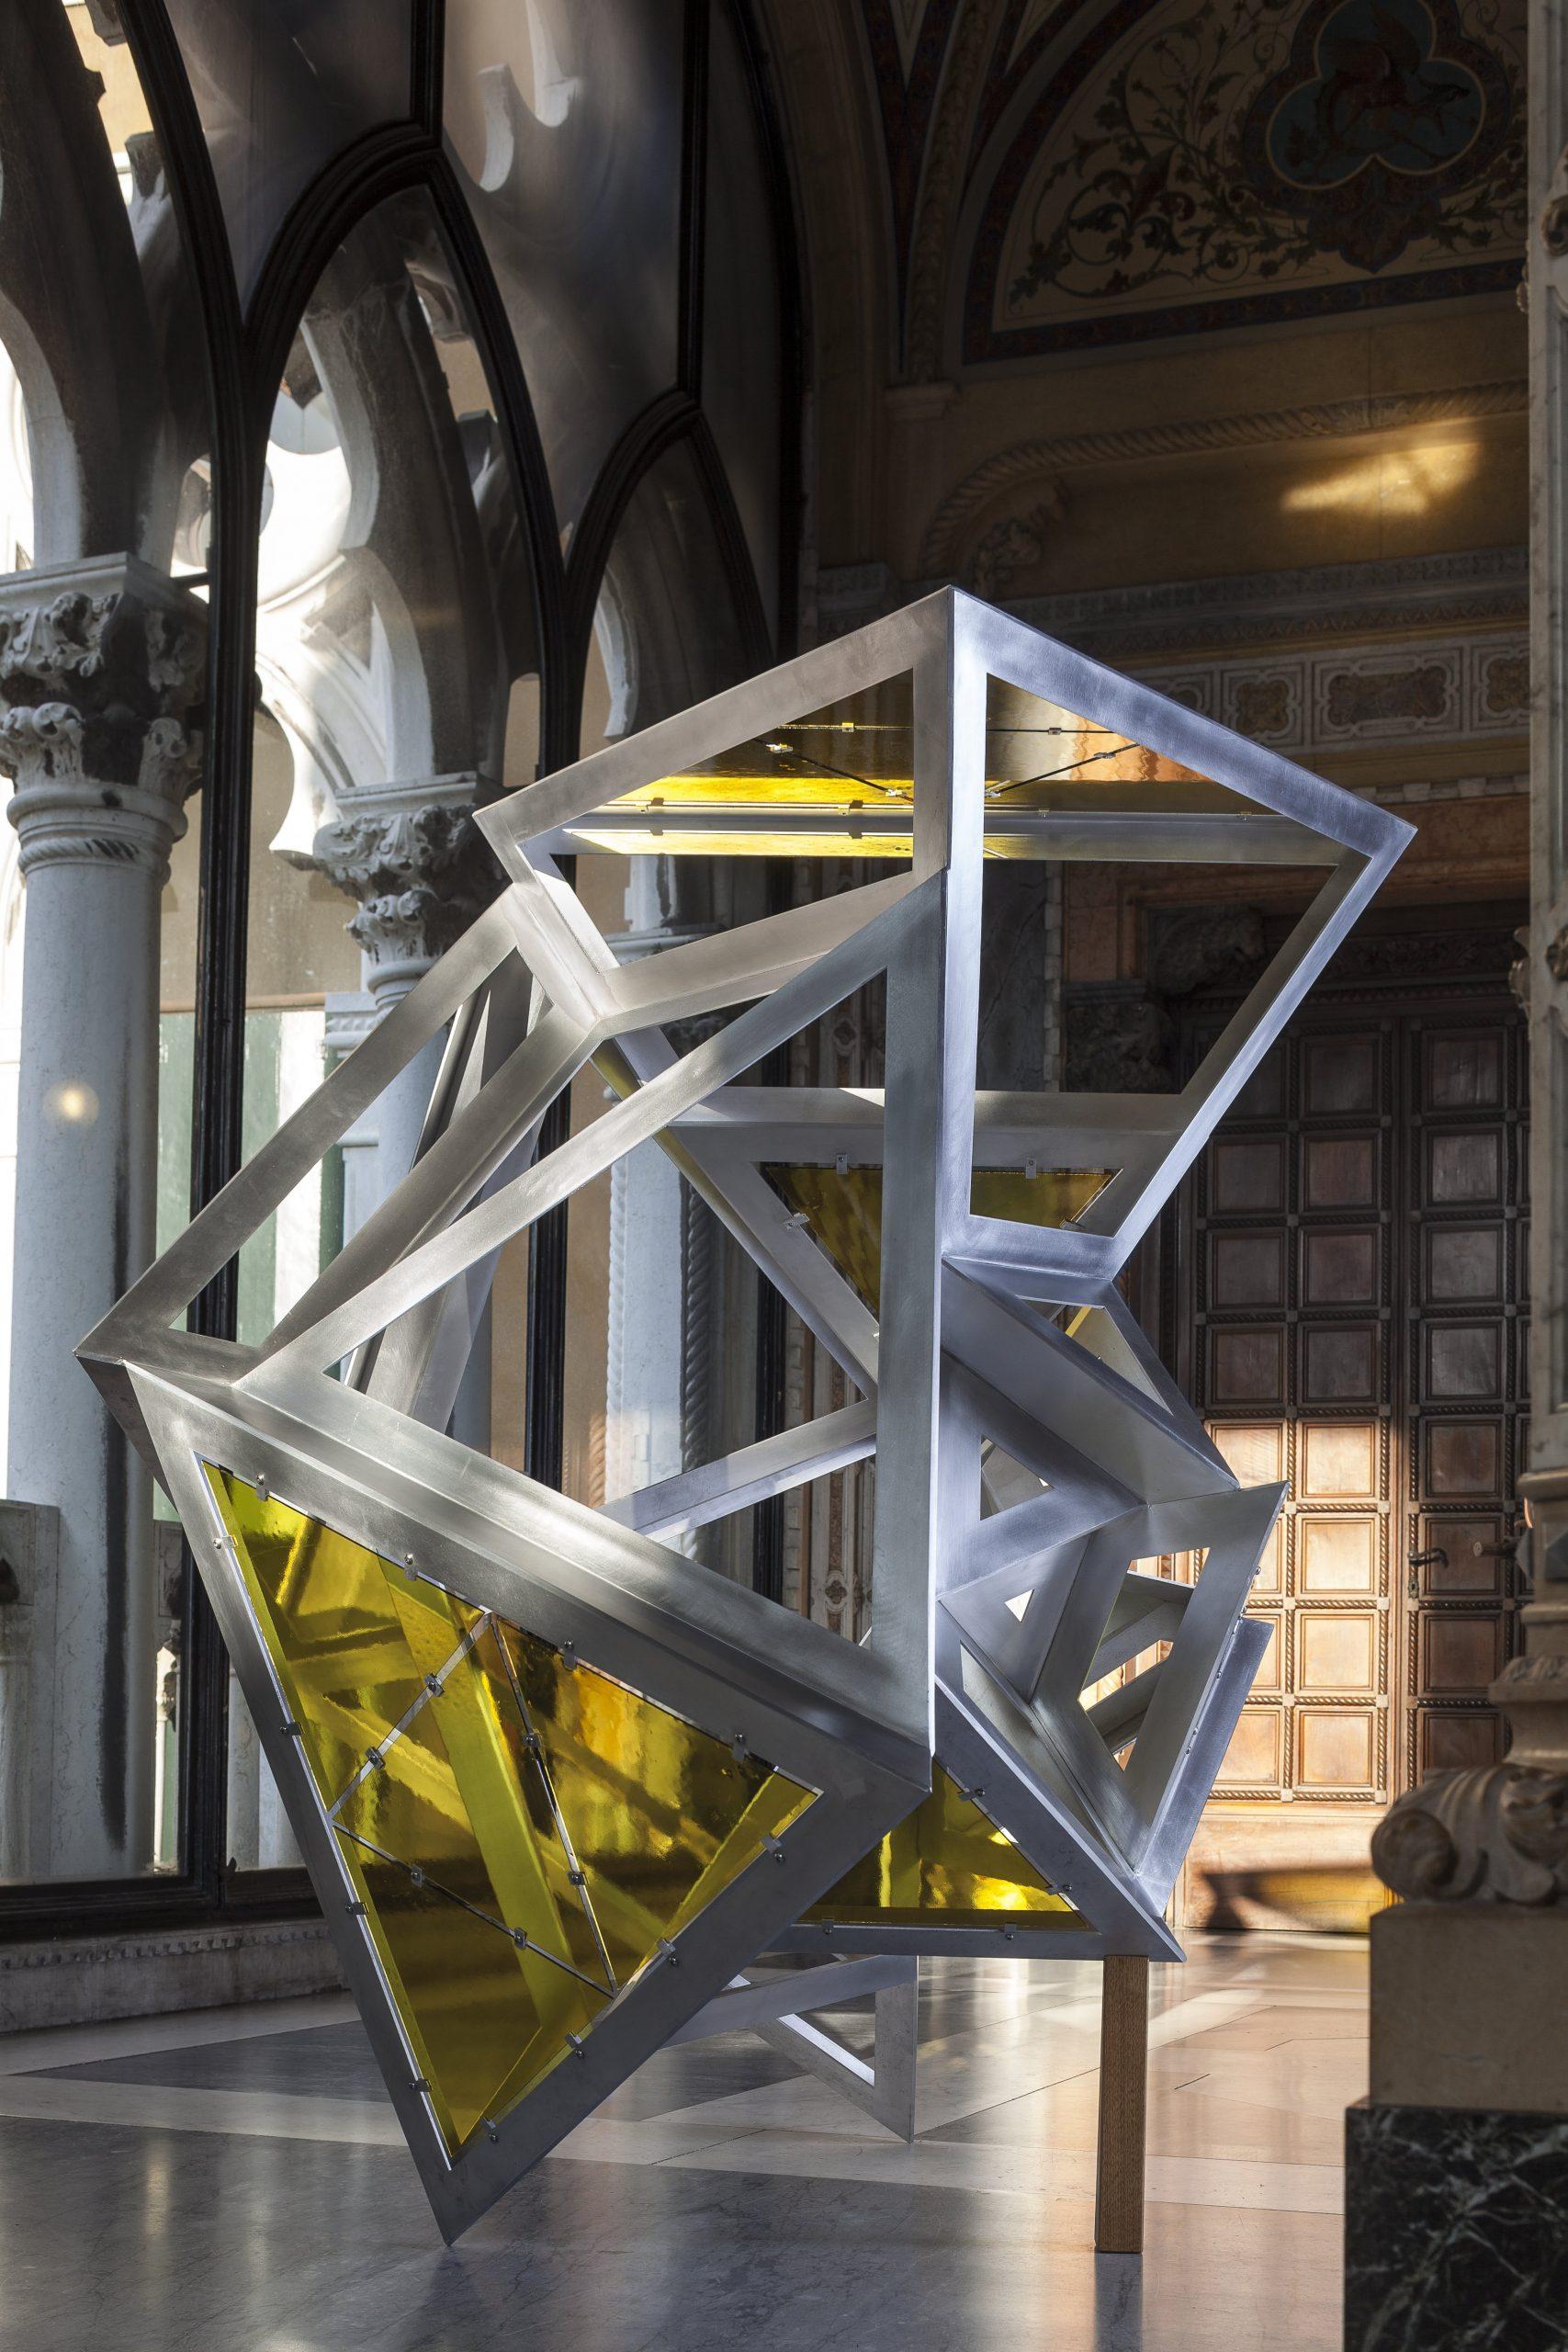 Conrad Shawcross' Perimeter Studies (Icosahedron) Arrangement 2 – Yellow Glass